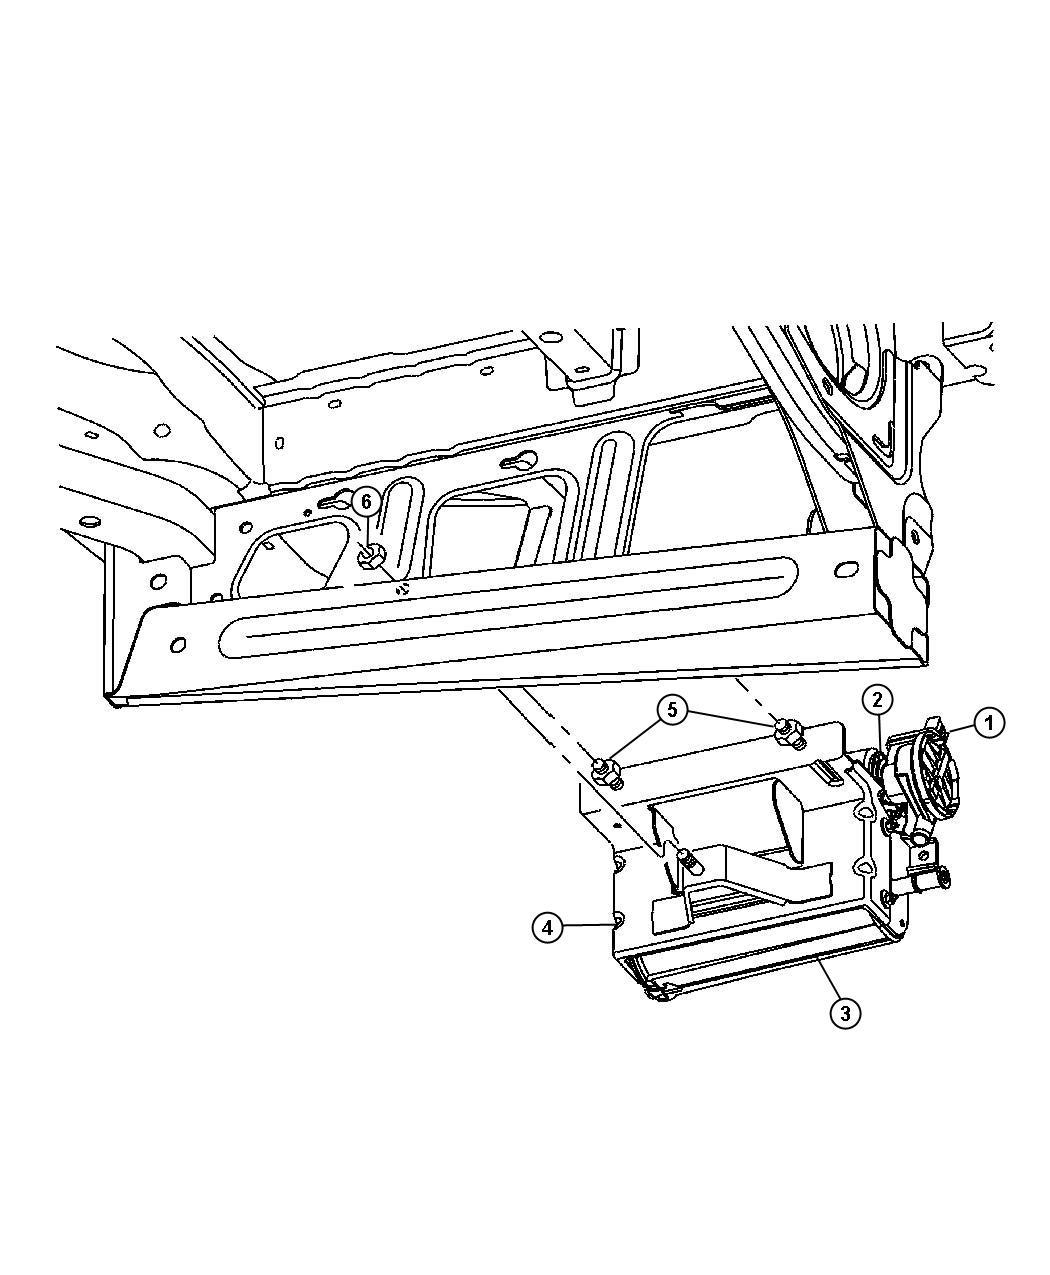 Jeep Grand Cherokee Detector. Esim, evaporative system